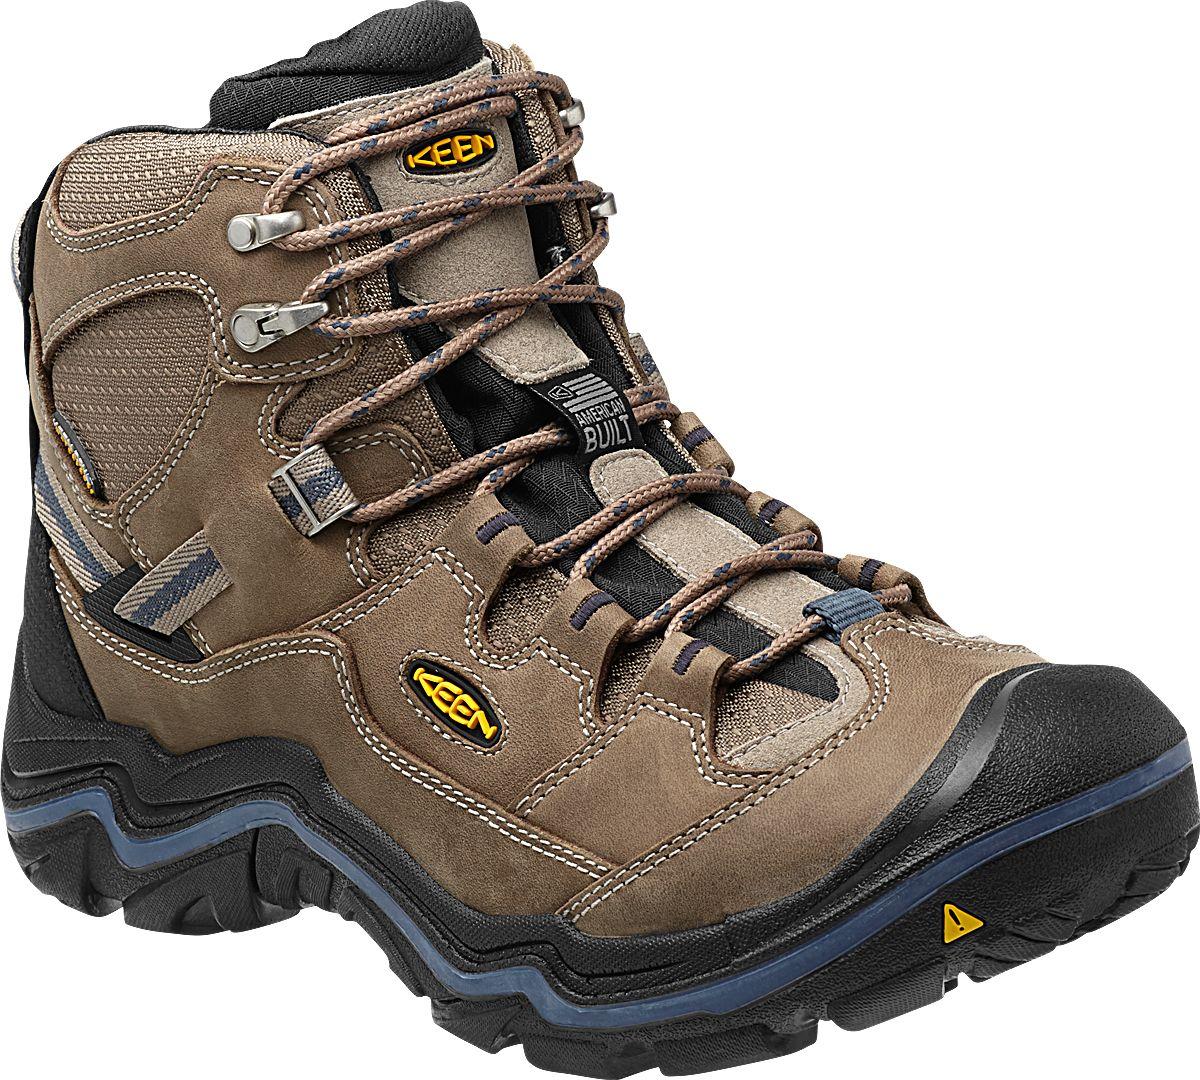 KEEN Durand Mid WP Boot - Men's